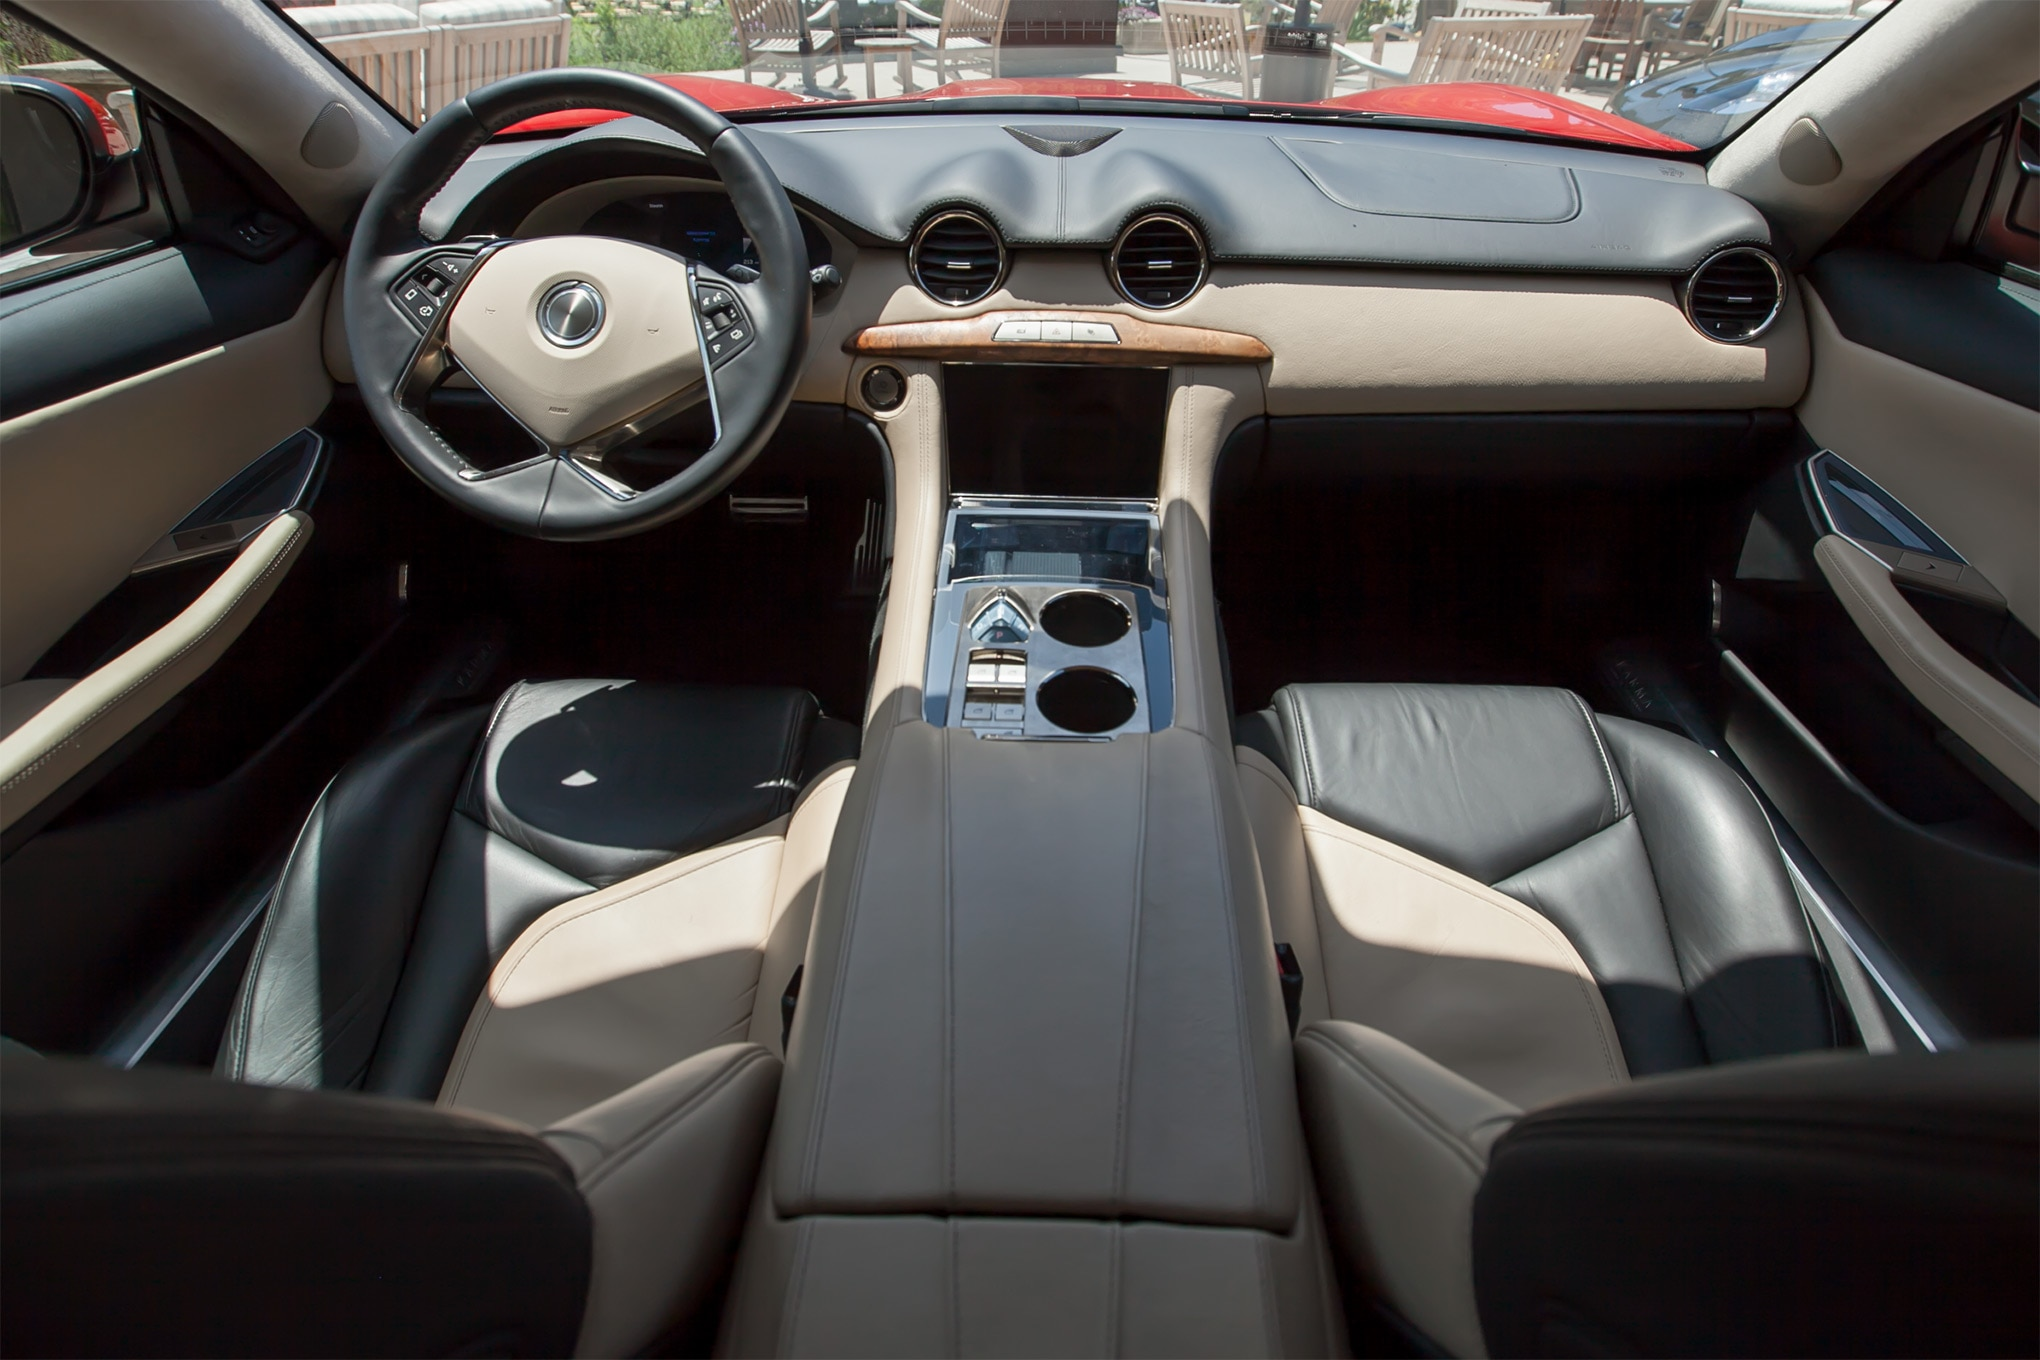 2018 Karma Revero First Drive Review | Automobile Magazine